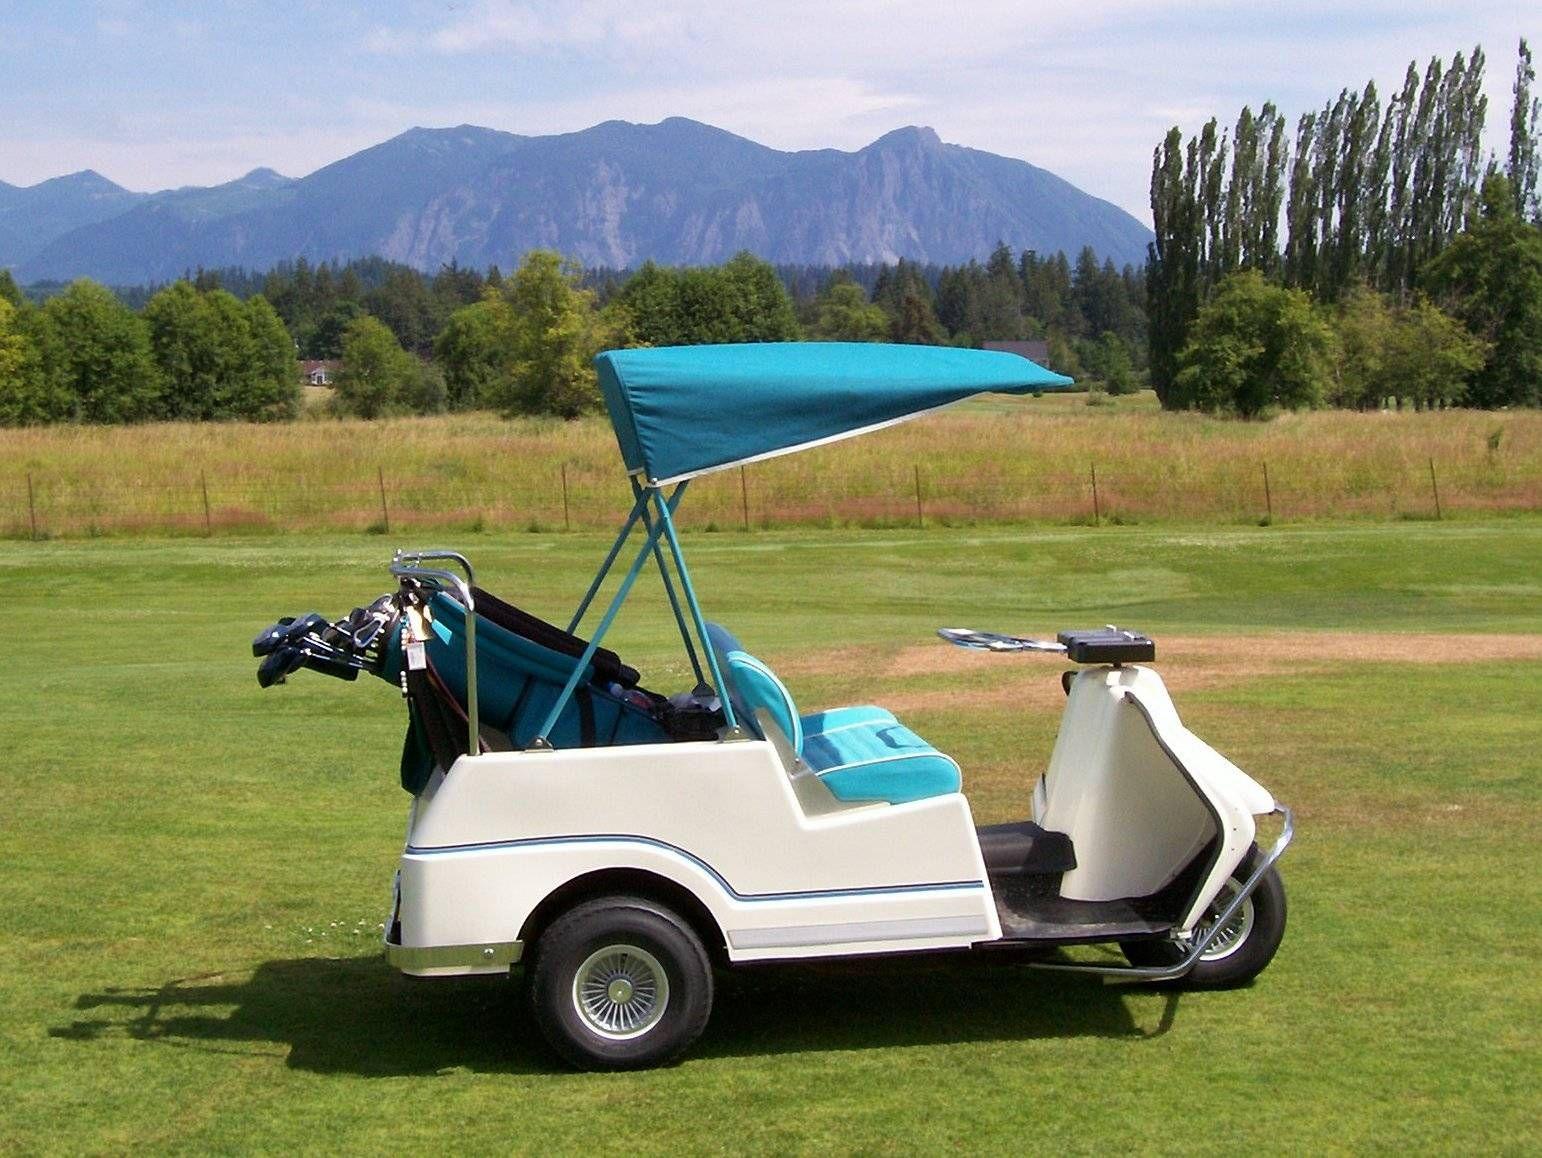 Pin by Joe Fabini on Stuff to Buy | Golf cart parts, Custom ... Golf Cart Covers Pga Store on nba golf store, callaway golf store, wilson golf store, mizuno golf store, tour golf store, college golf store, usga golf store, ppg golf store, nike golf store,